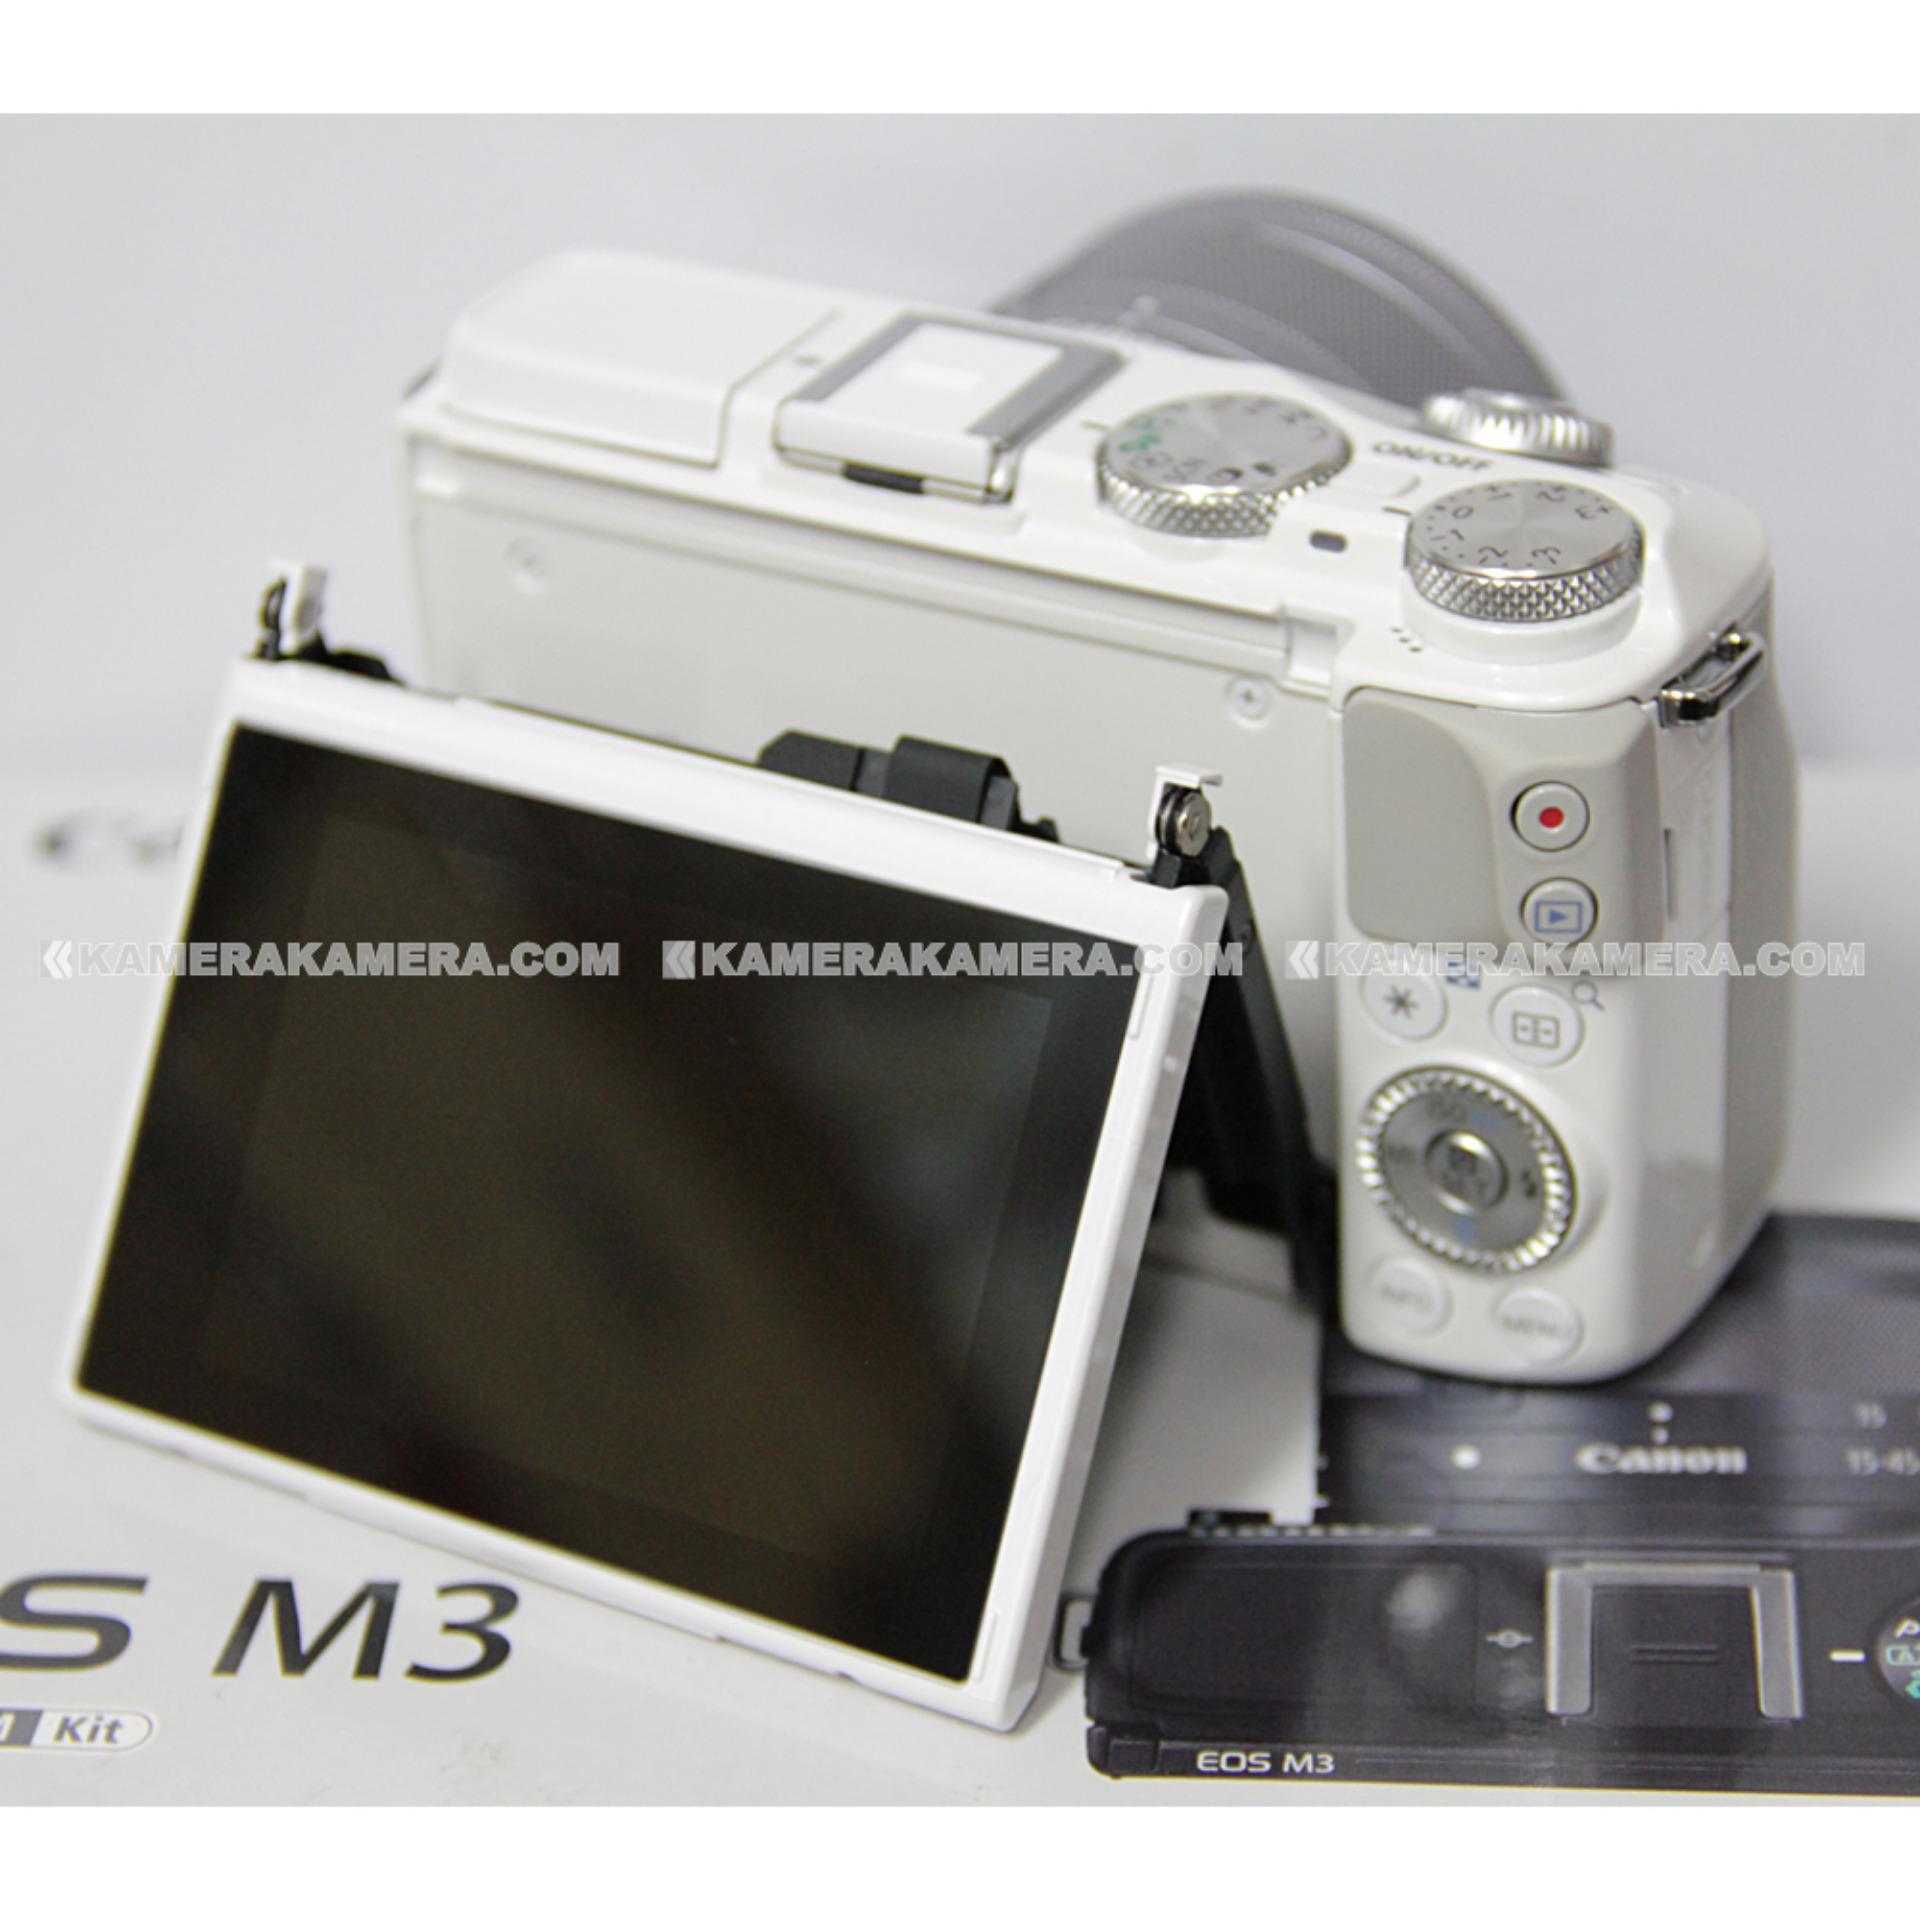 Harga Penawaran Canon Eos M3 Ef M15 45 Is Stm Kit White 242mp M10 15 45mm 18 Mp Hitam 242